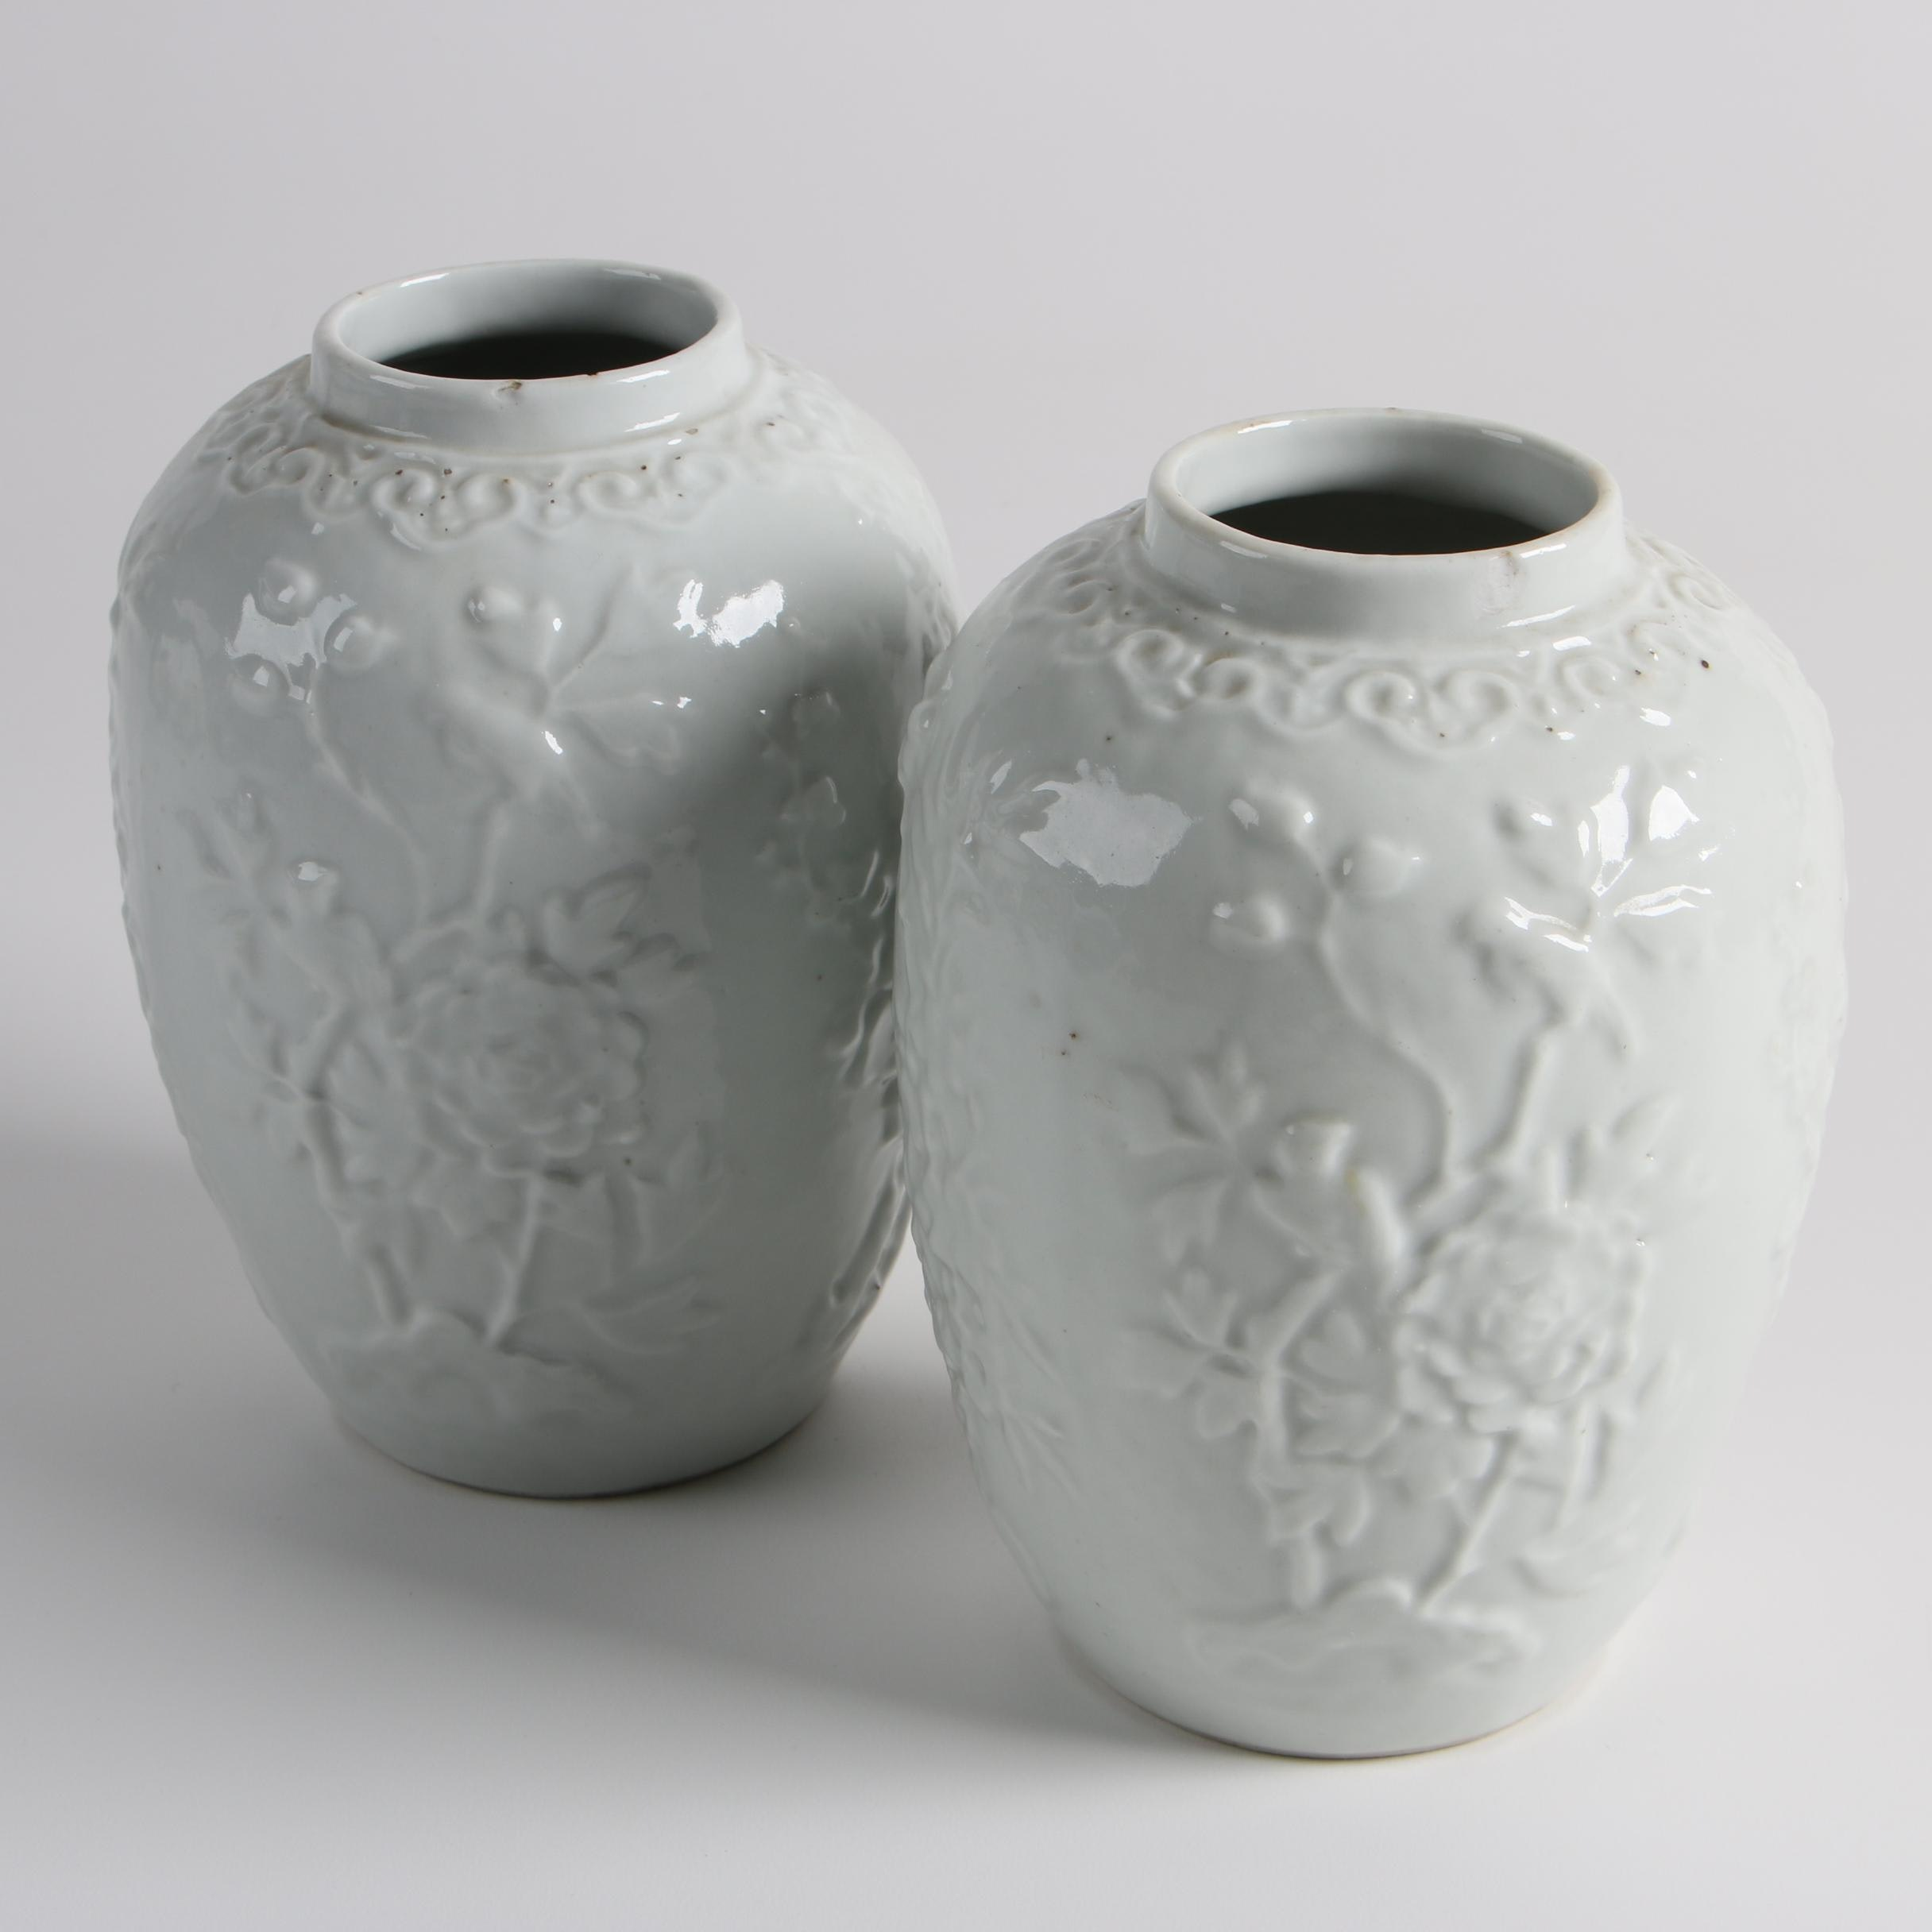 Chinese Blanc de Chine Prunus Vases